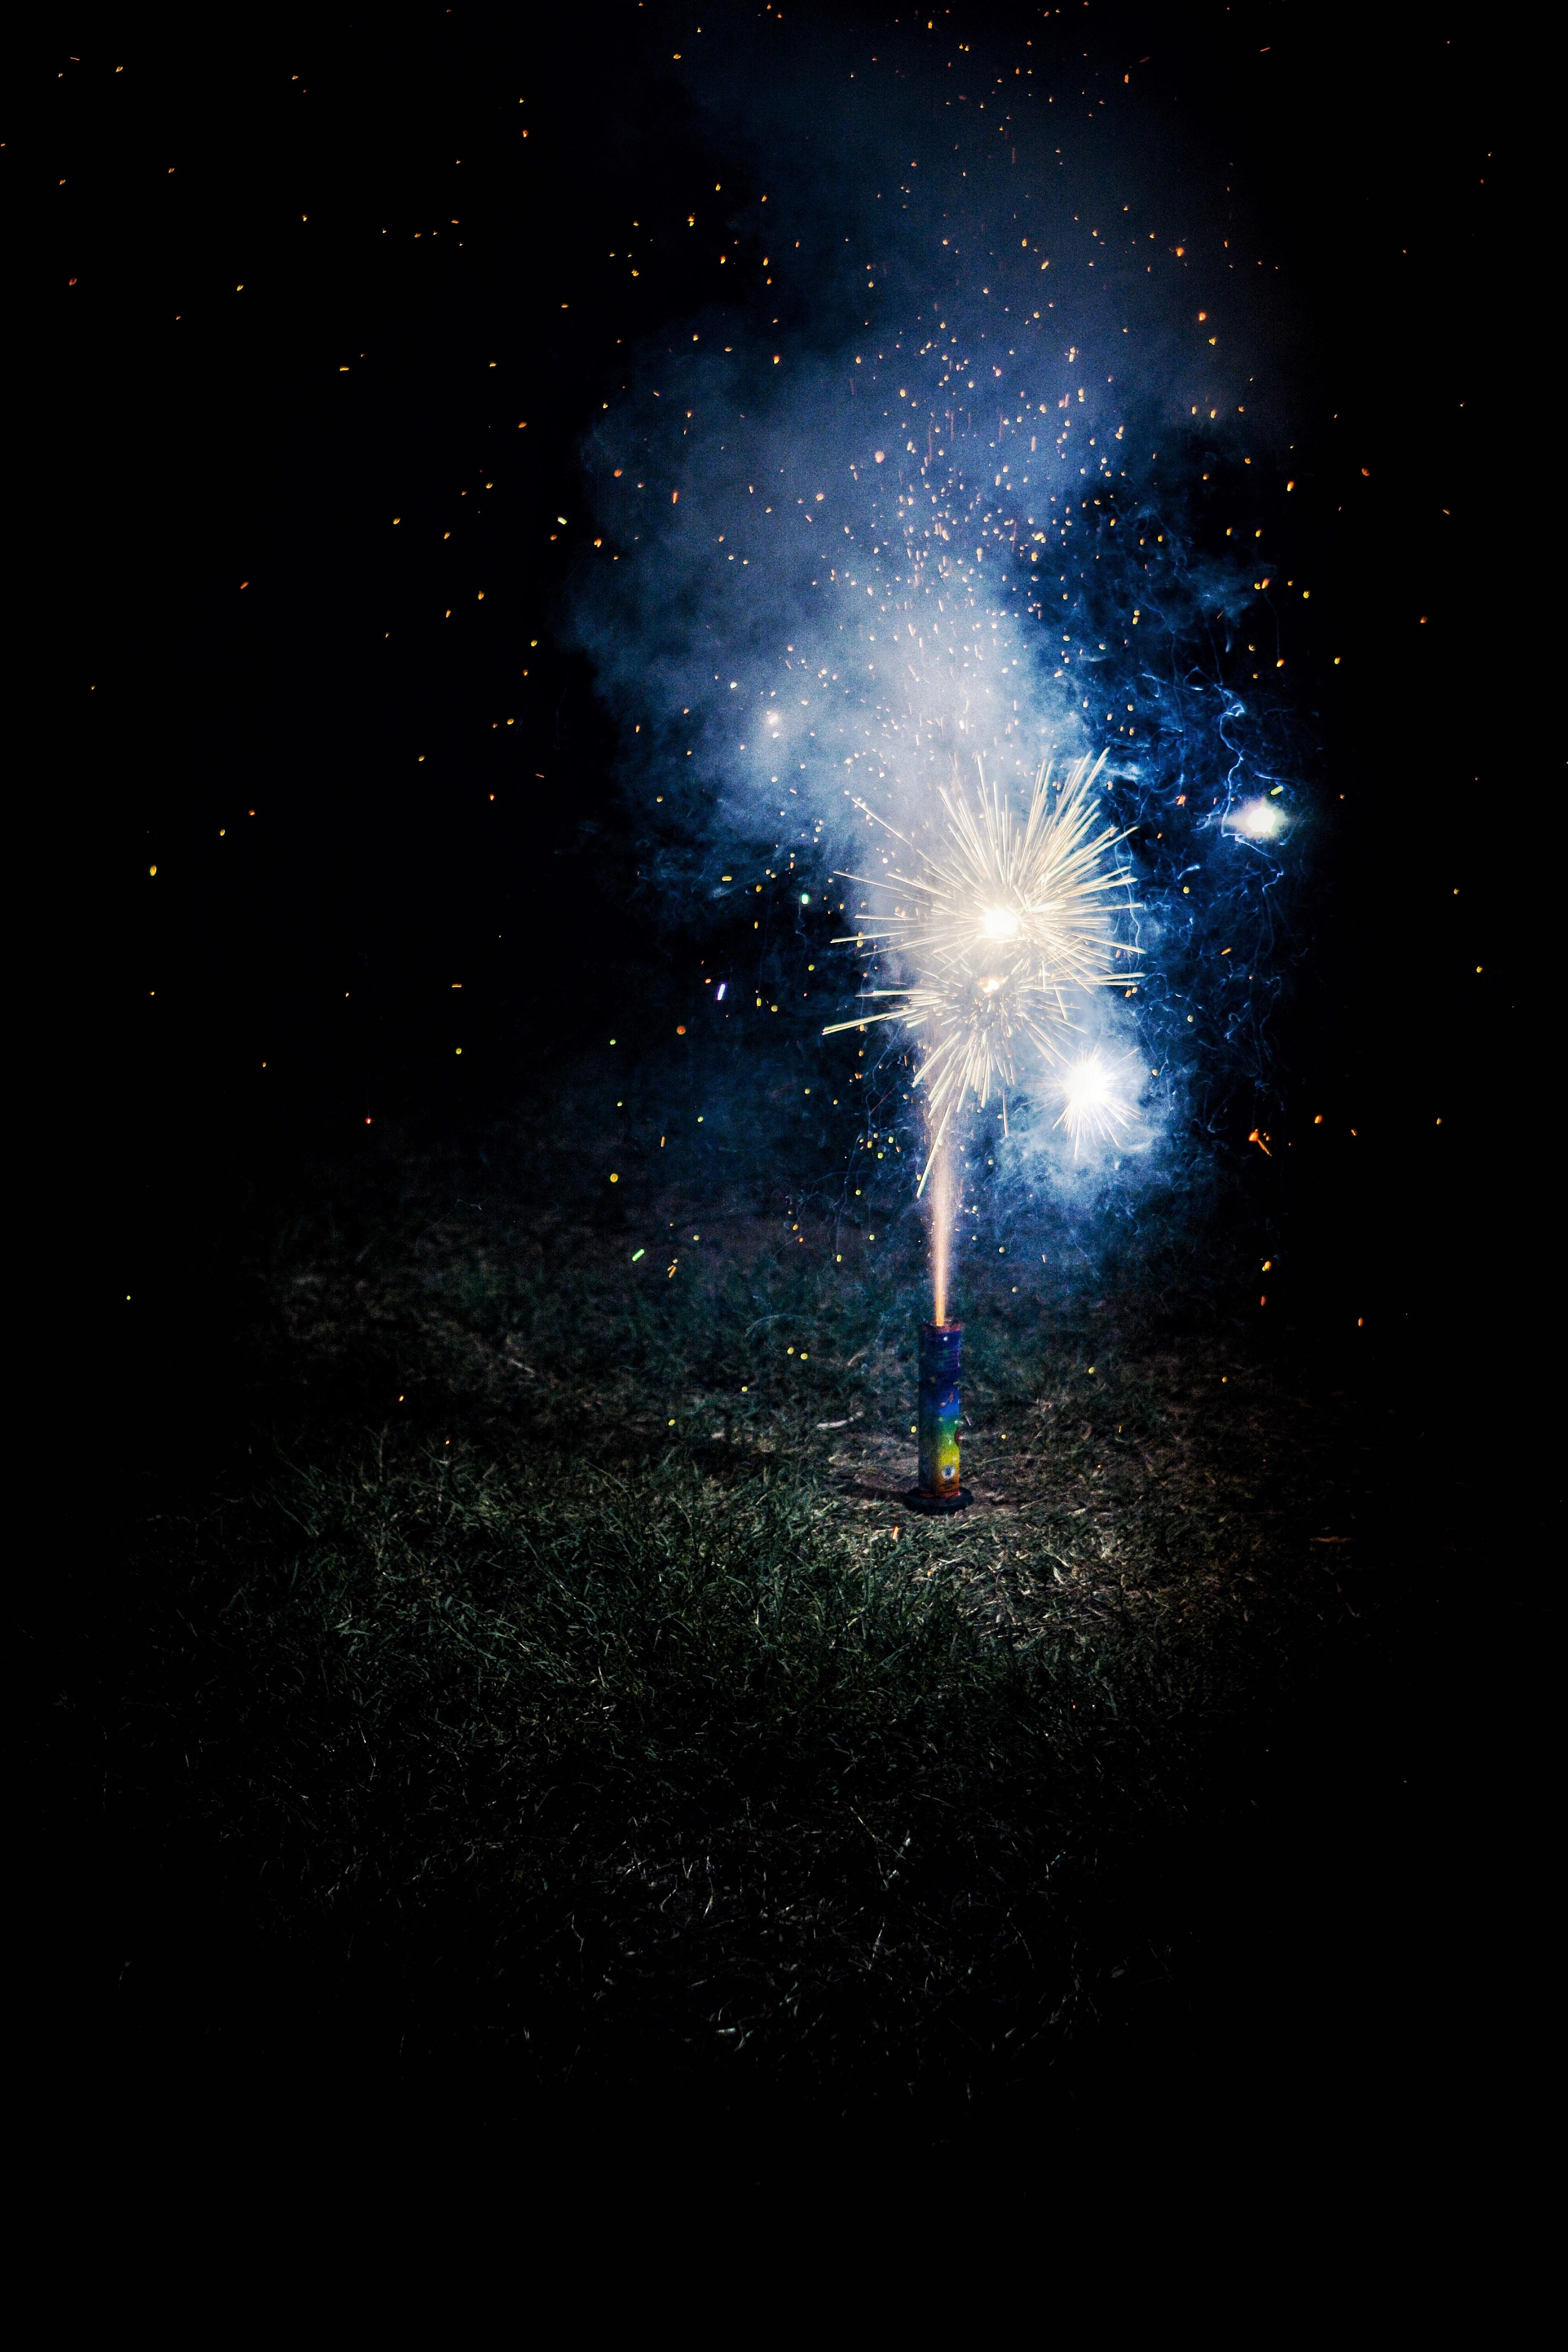 Gambar air langit suasana ruang kegelapan galaksi kembang air alam langit malam suasana ruang kegelapan galaksi kembang api bumi alam semesta peristiwa tengah malam voltagebd Images